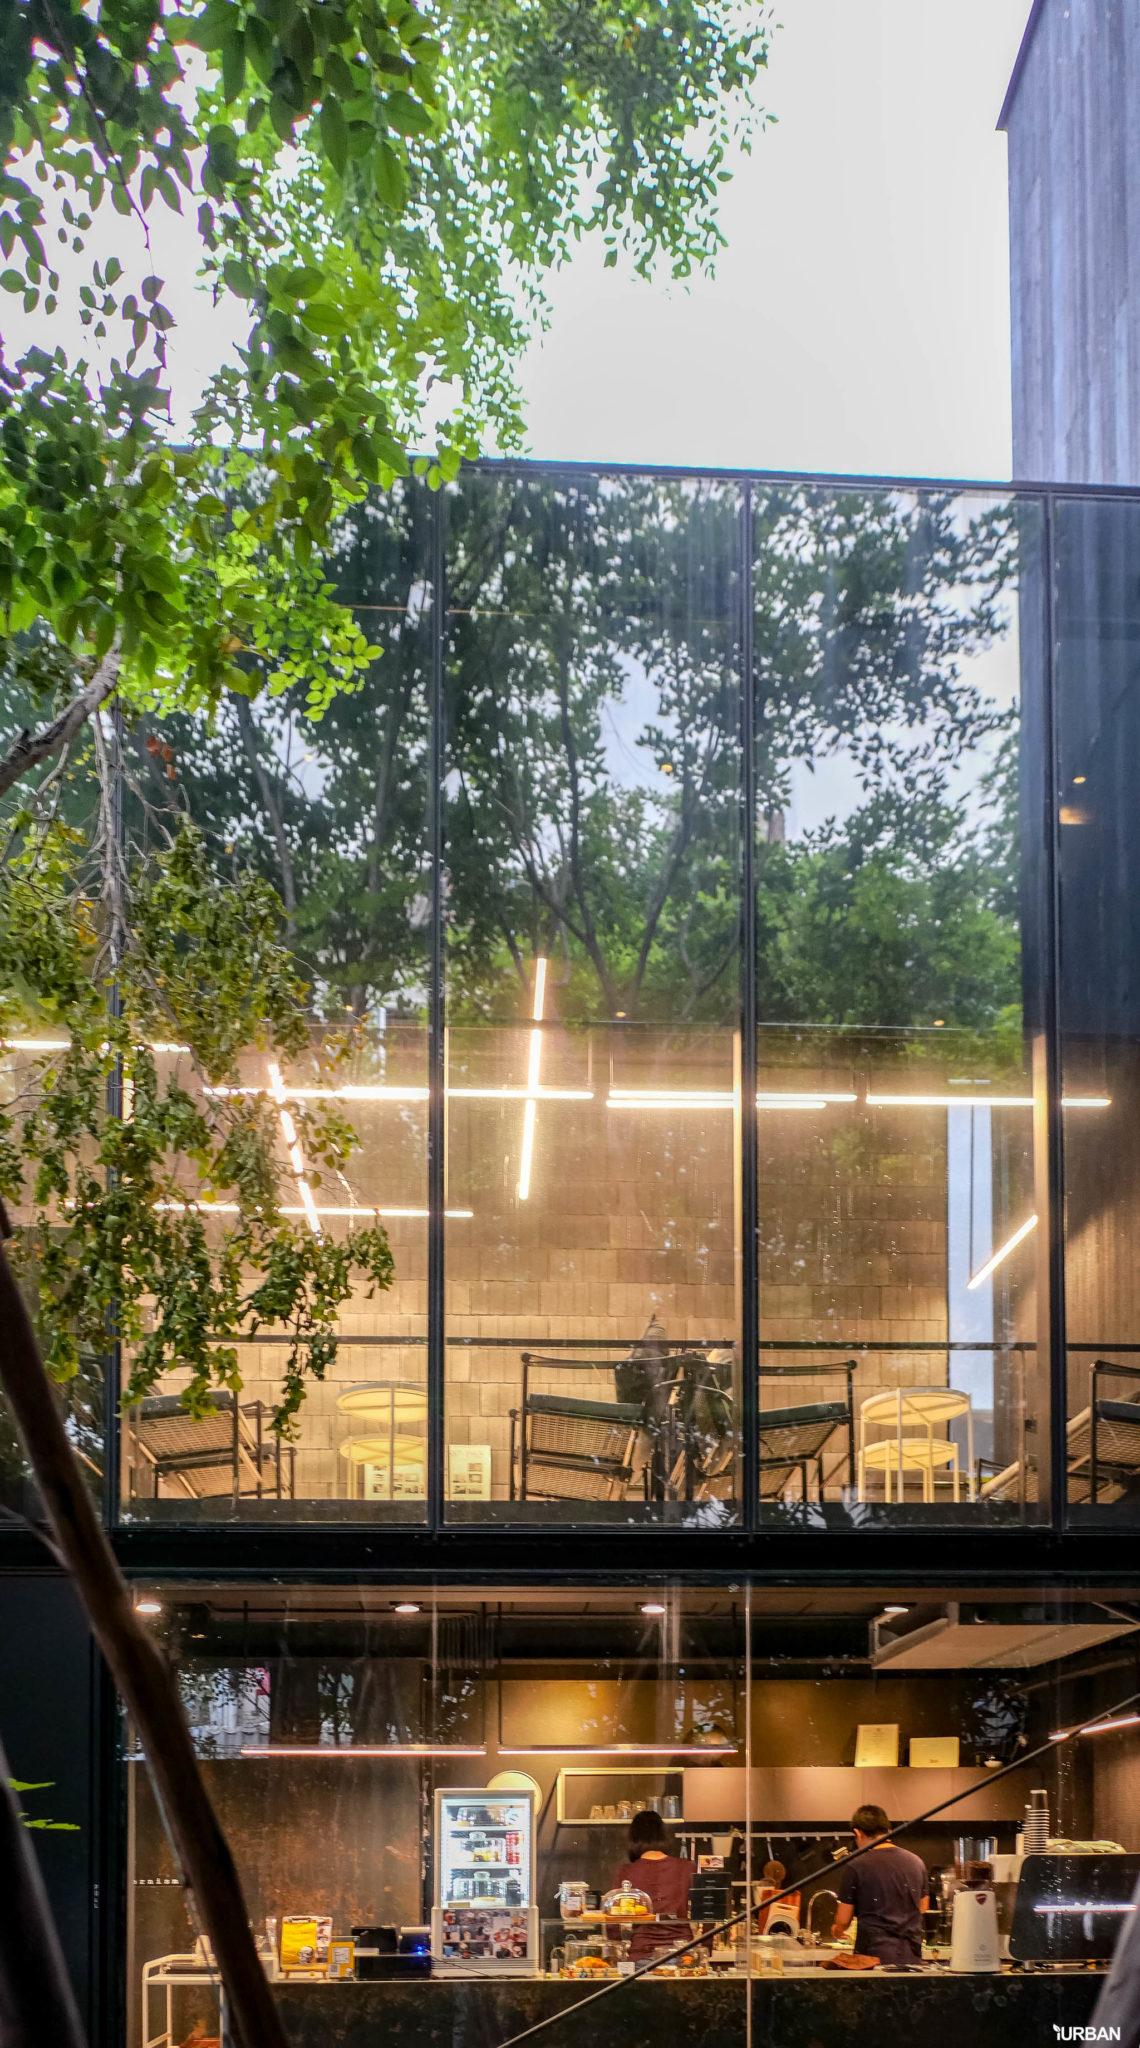 MODERNISM: ARCHITECT CAFE คาเฟ่ที่จะทำให้คุณได้ทึ่งพร้อมสัมผัสของจริงกับงานสถาปัตยกรรมสไตล์ modern 16 -